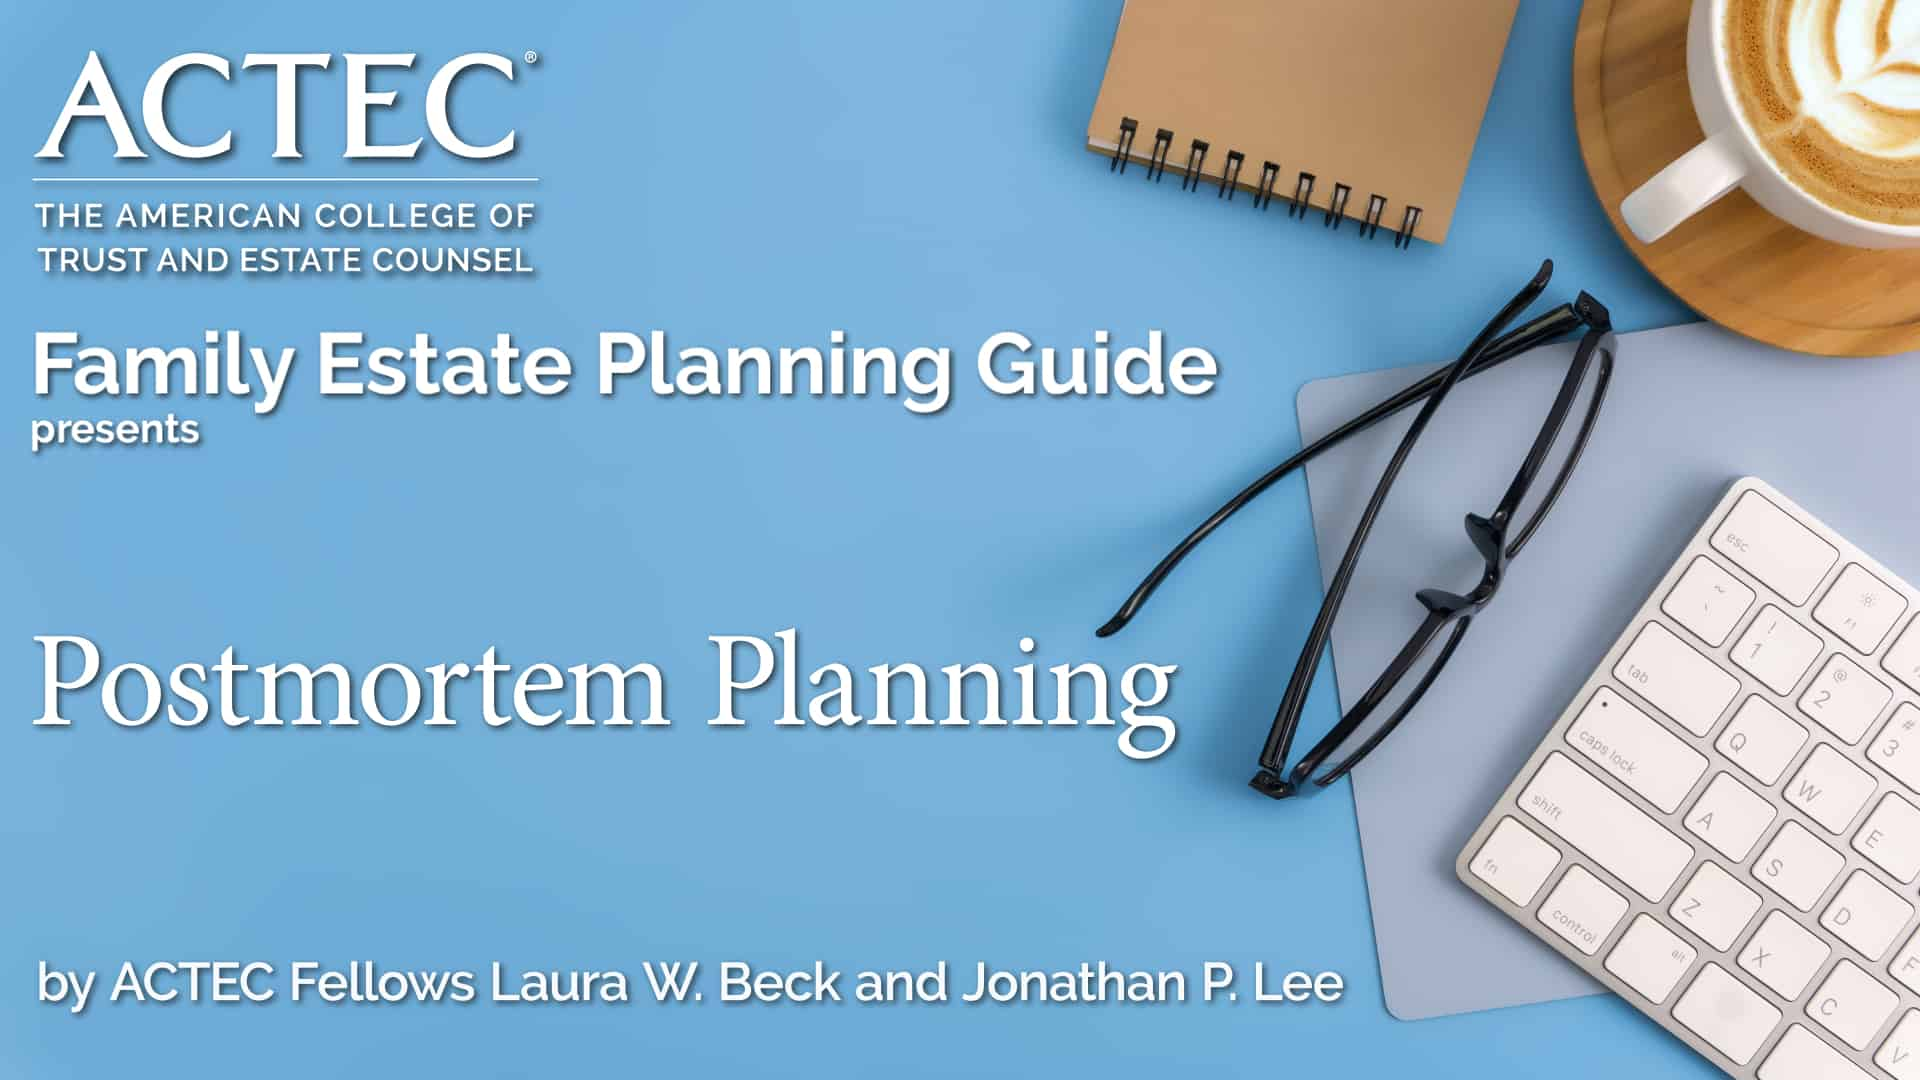 Postmortem Planning